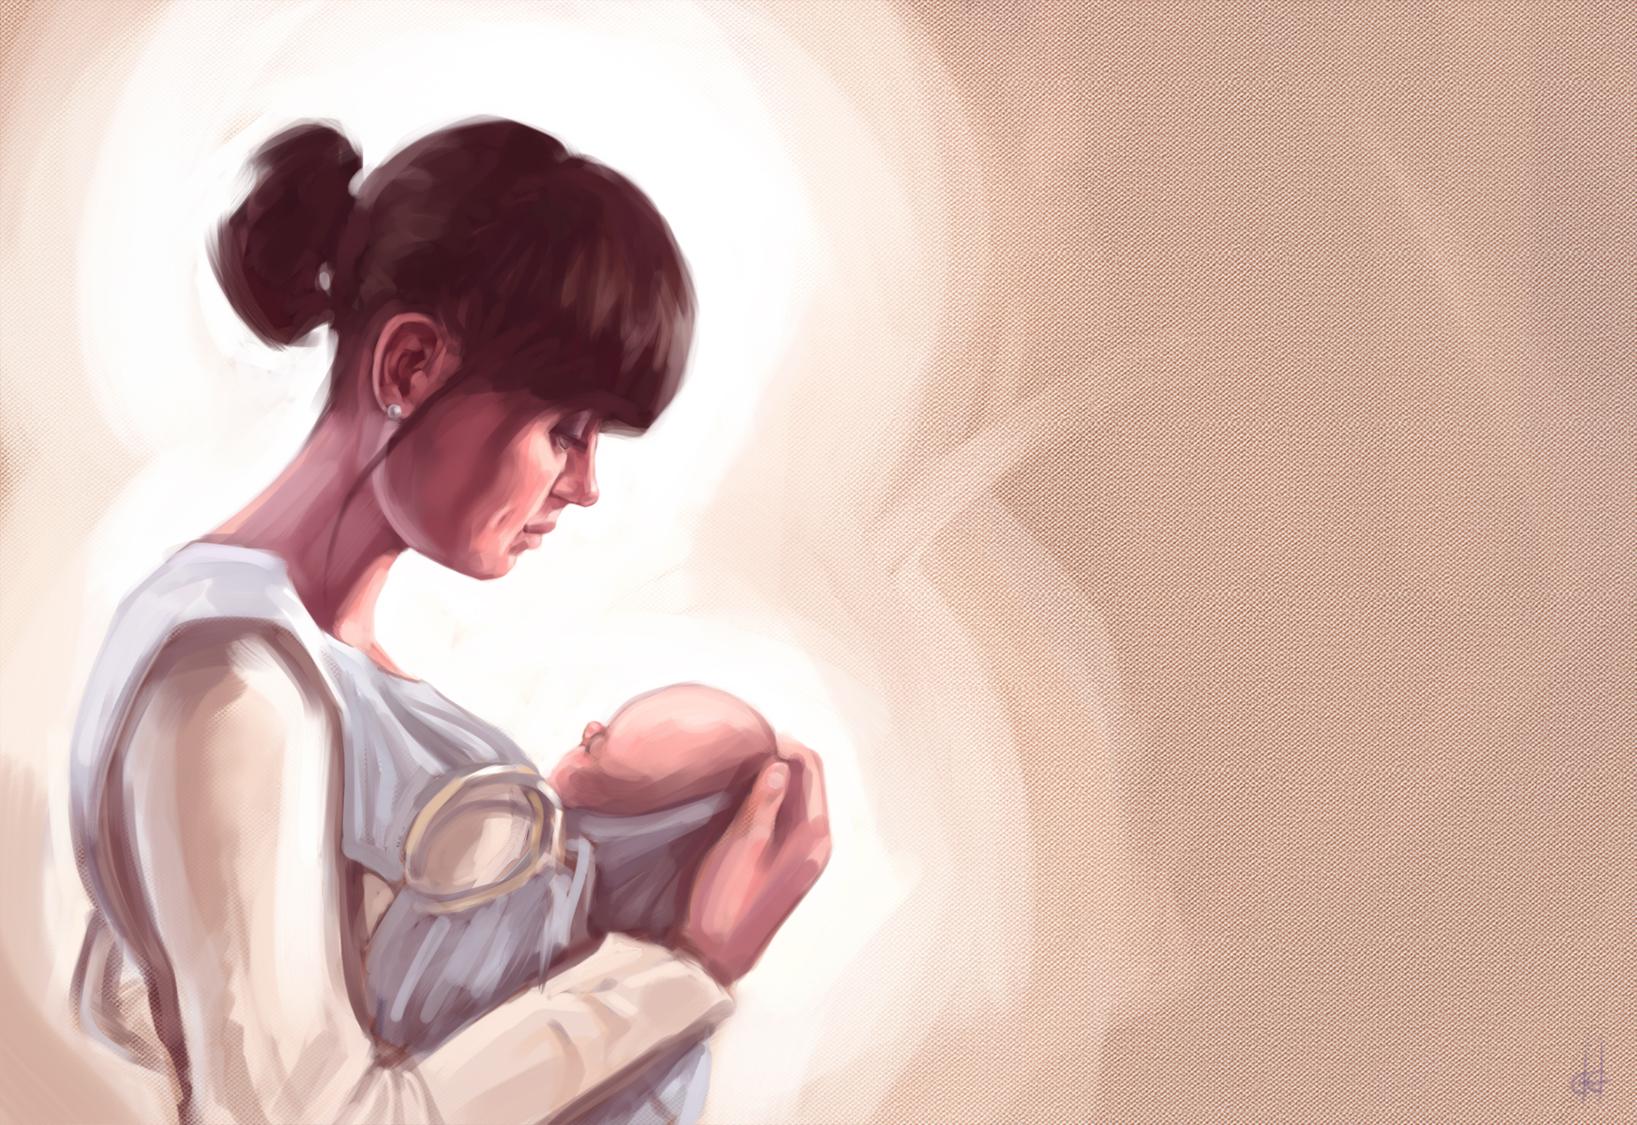 2013-01-31-huffpo-web-prod-www-content-generated-theblog-BabywearingillustrationbyGGWEB2.jpg